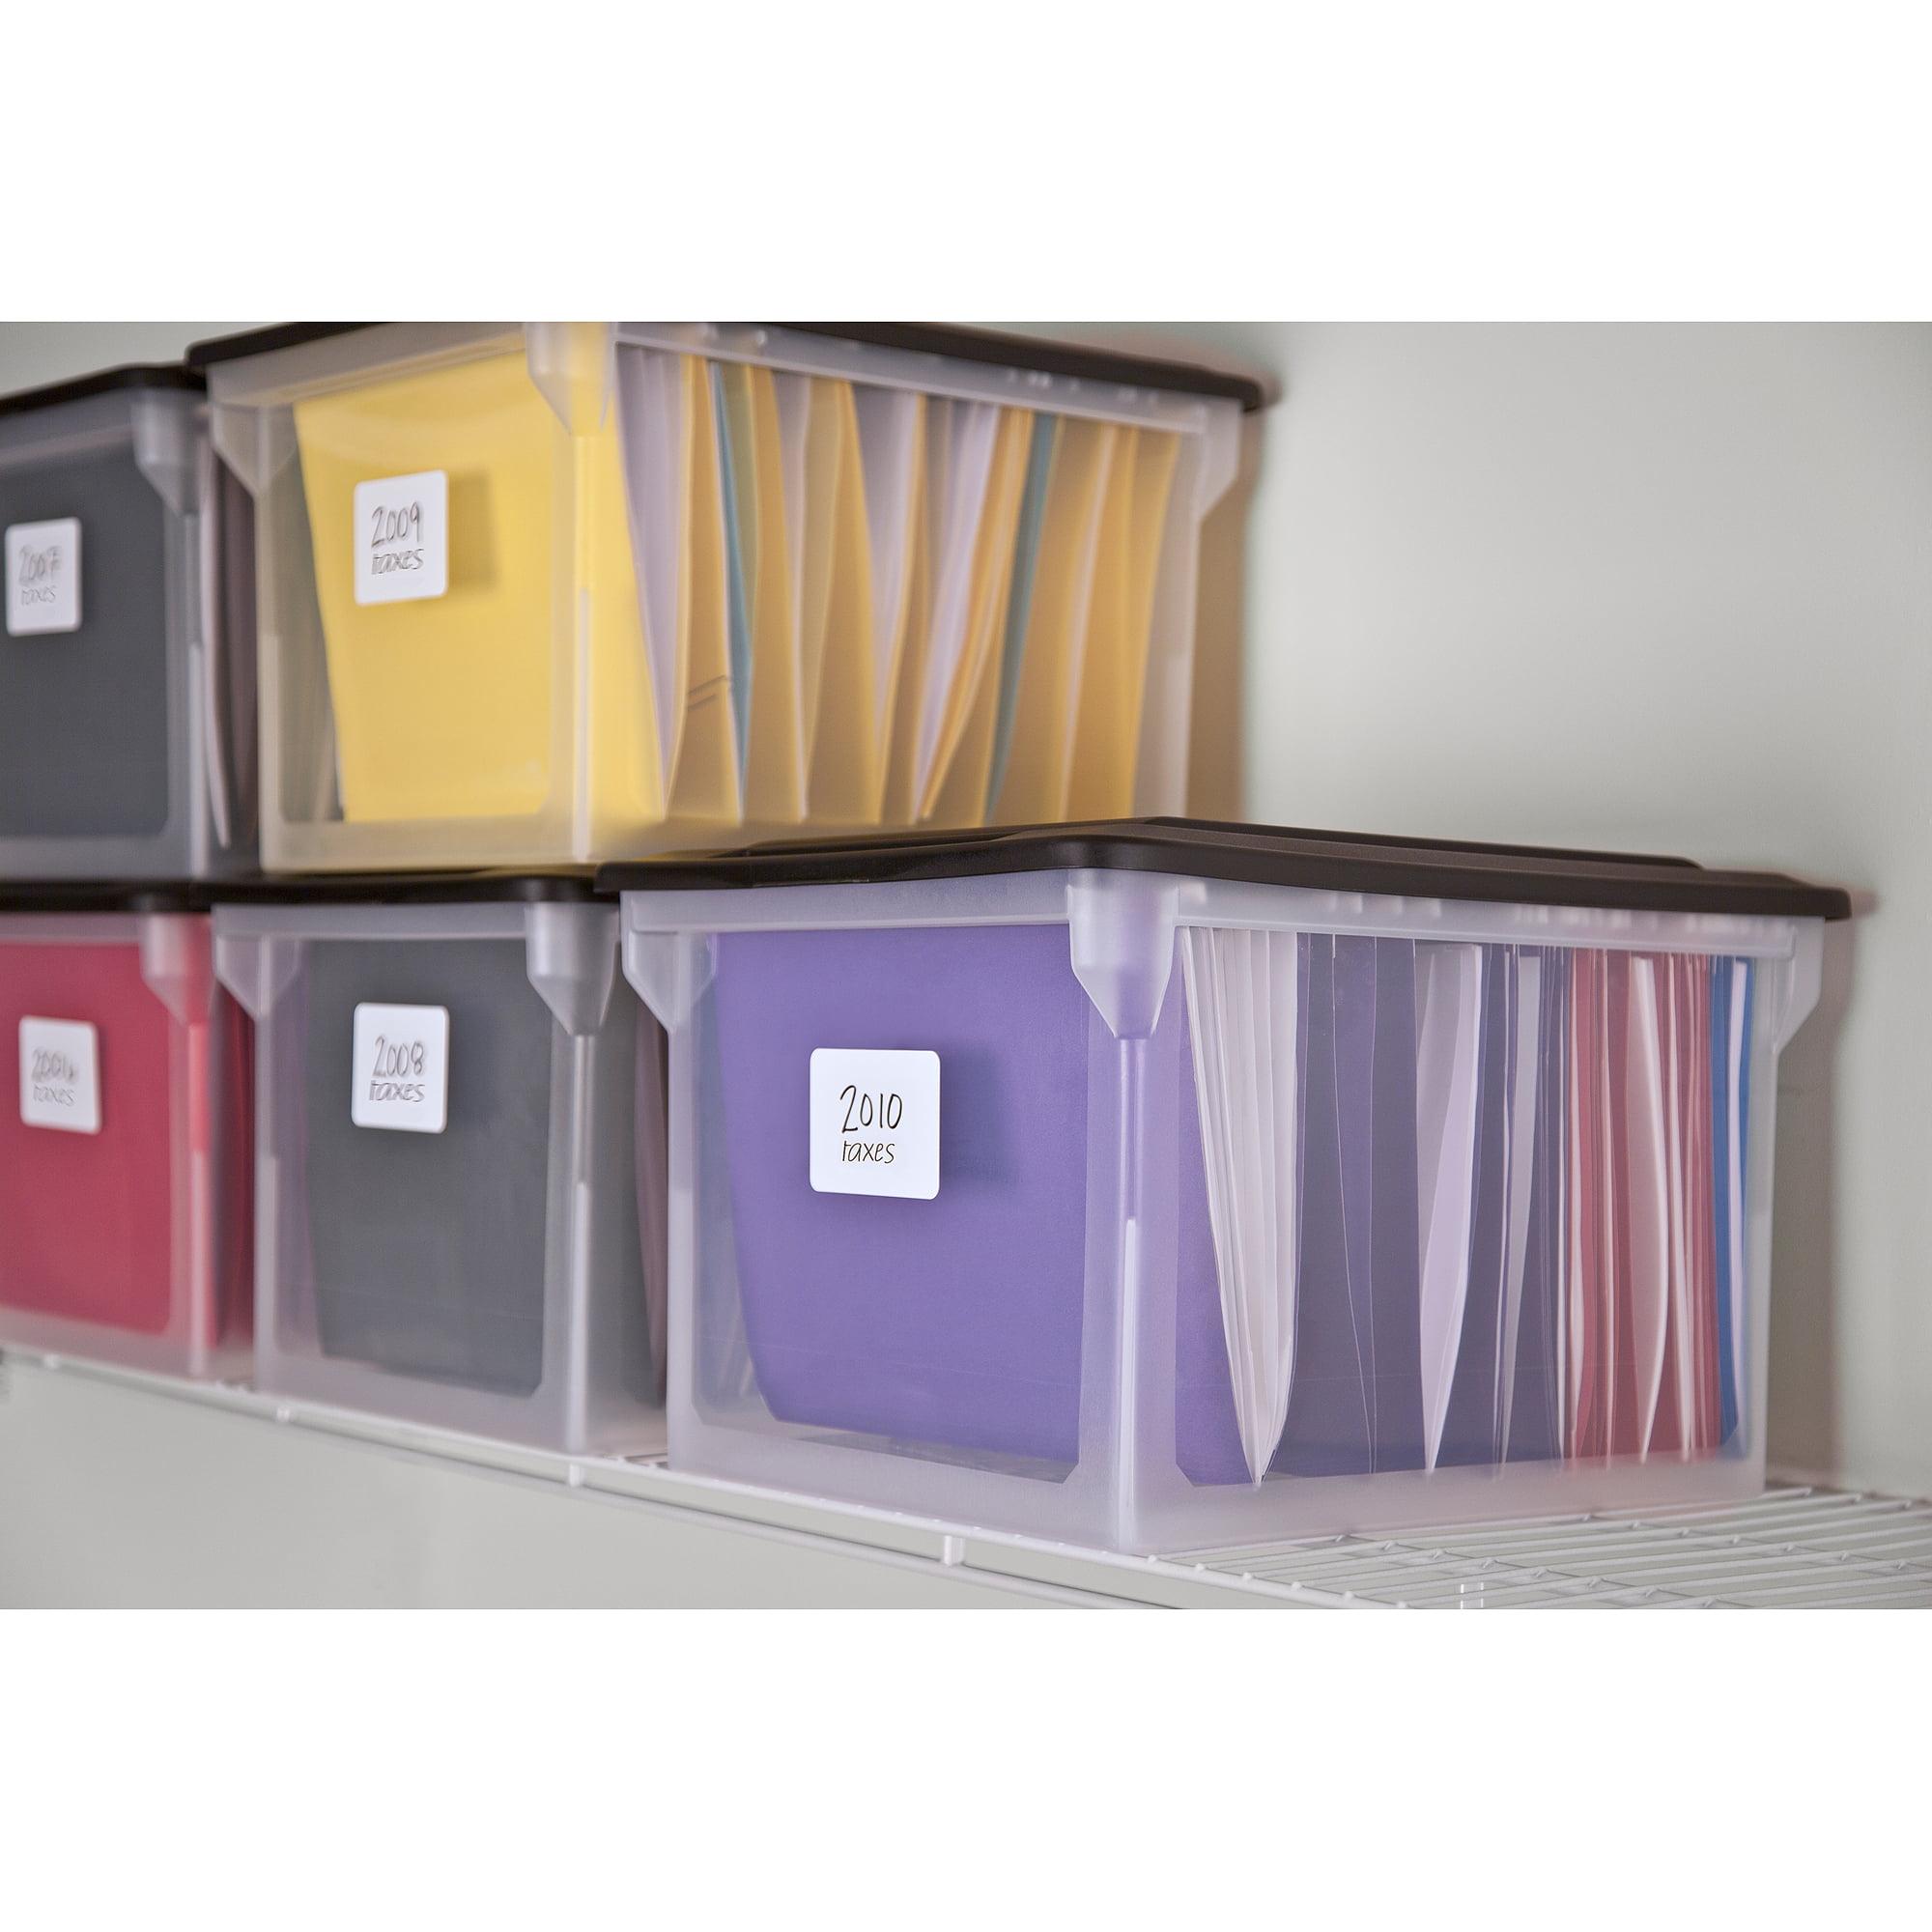 Hanging Files For Filing Cabinets Sterilite Legal Letter File Box Walmartcom